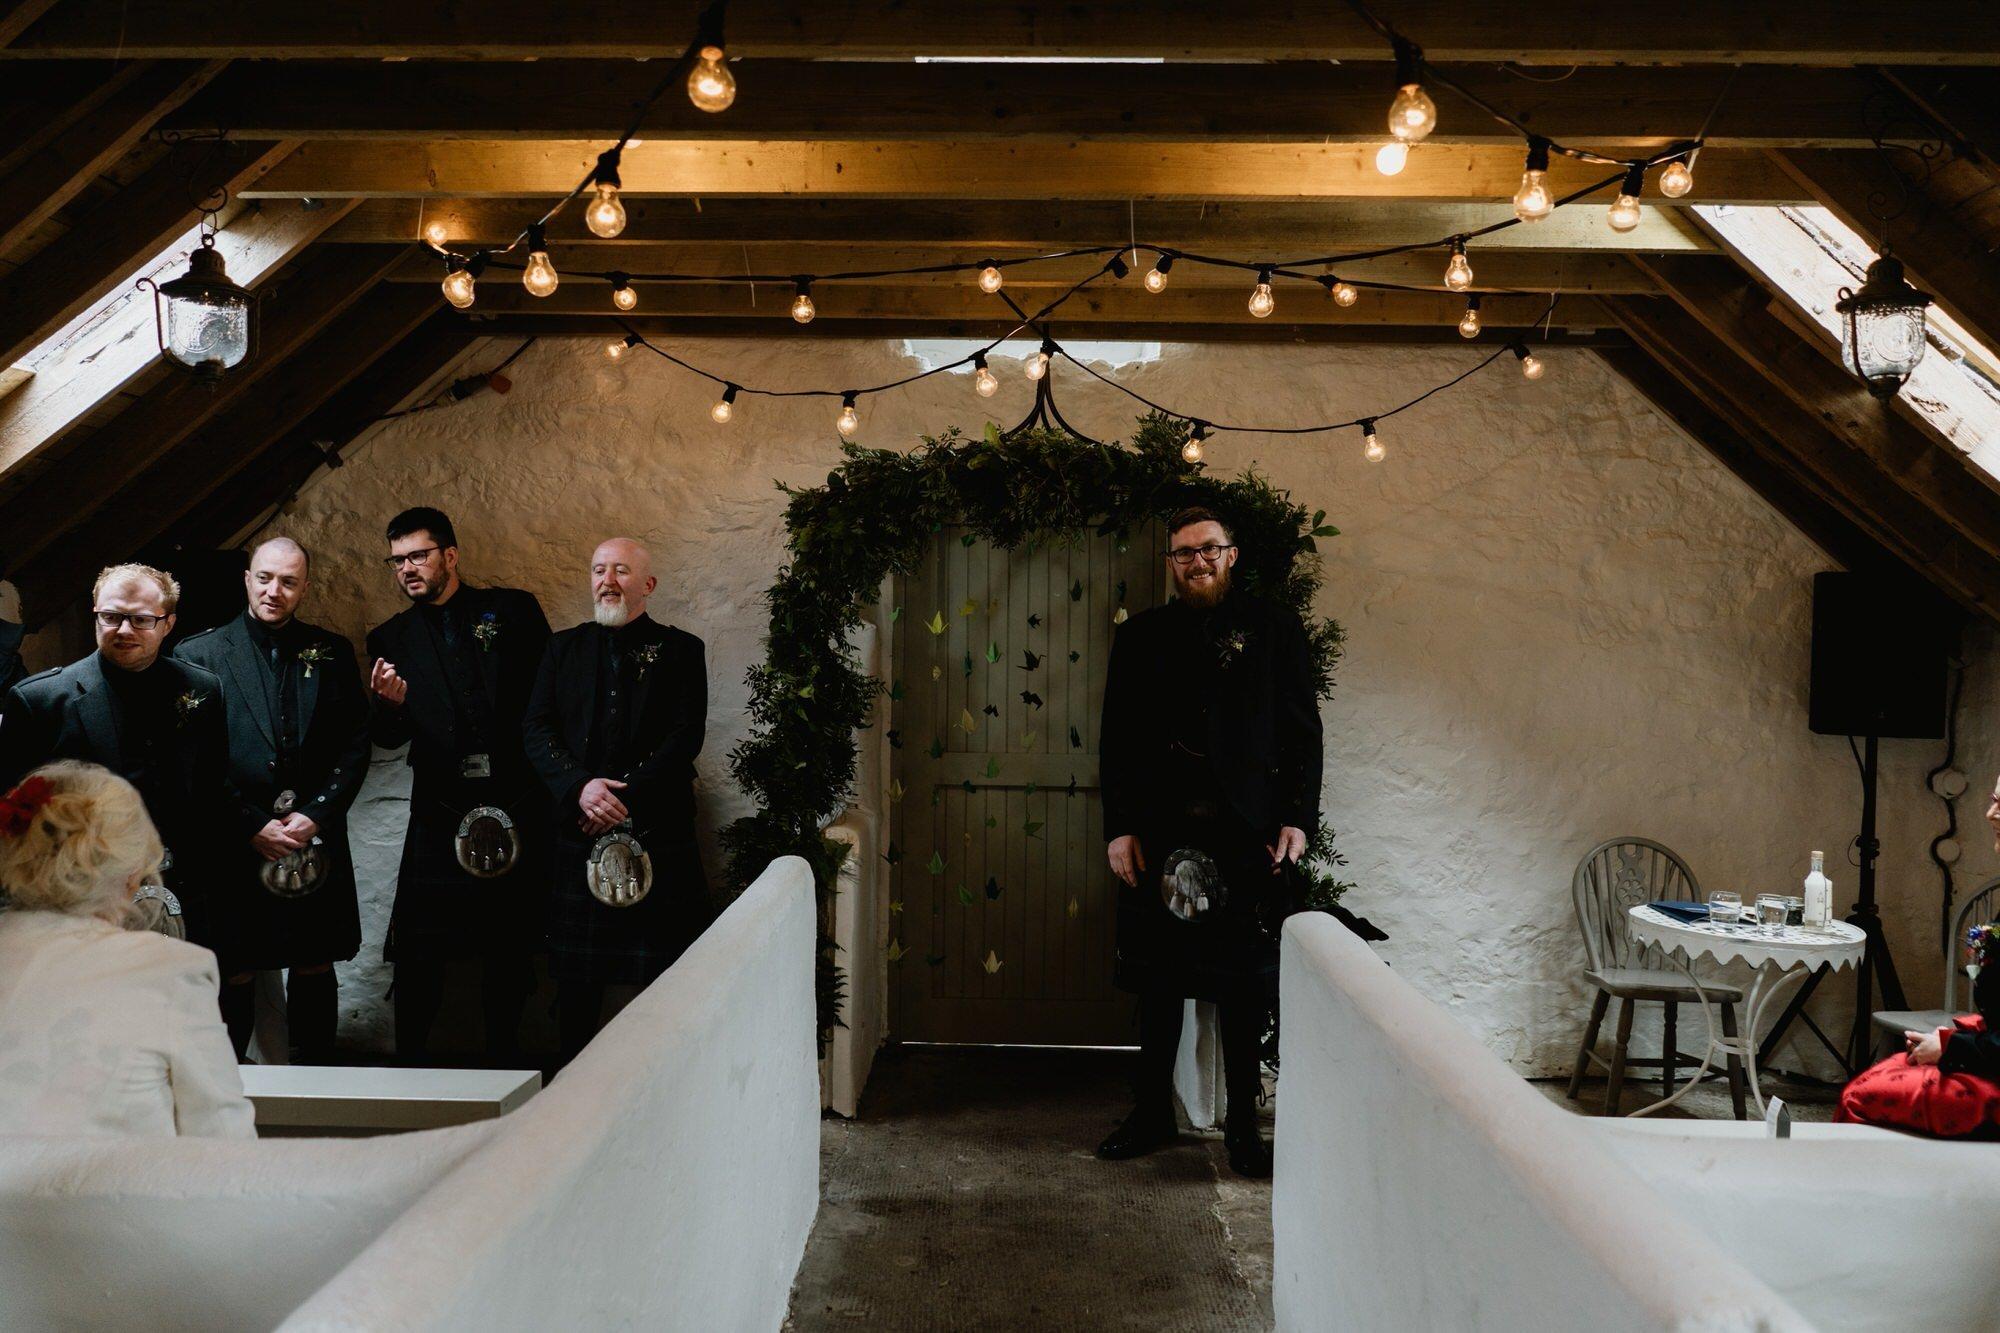 015 TIN SHED KNOCKRAICH WEDDING AUSTRIAN SCOTTISH ZOE ALEXANDRA PHOTOGRAPHY